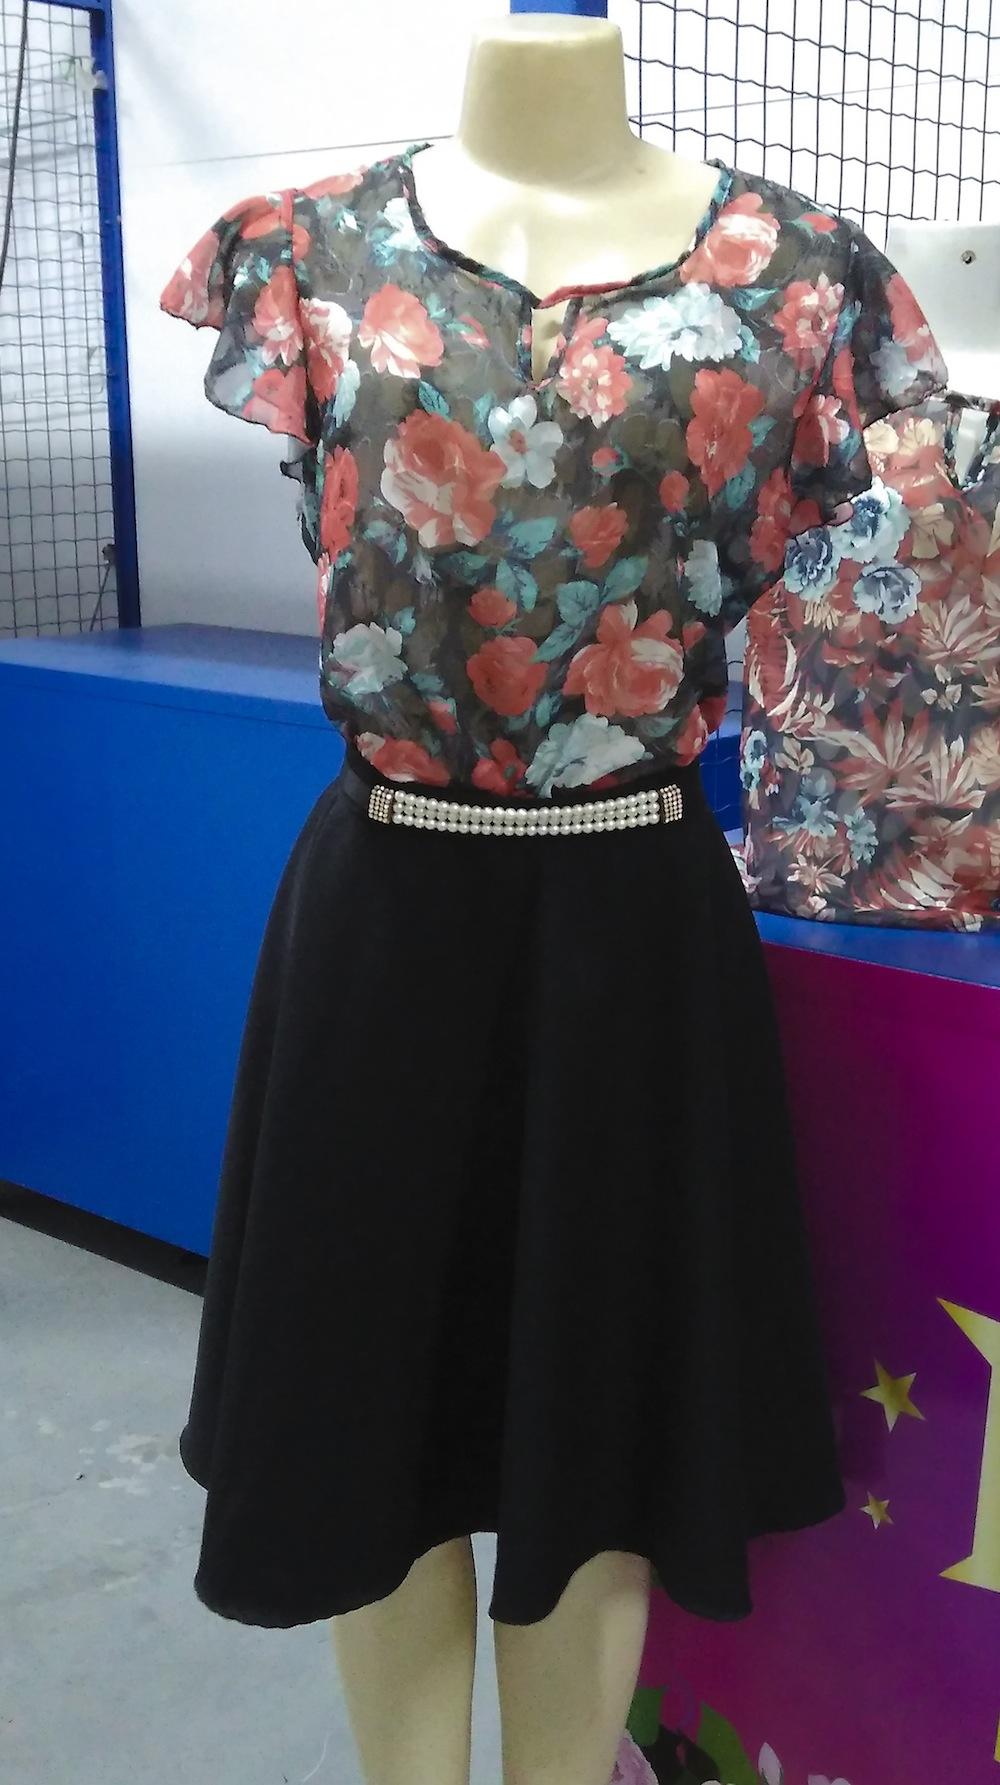 Fashion De Moda: Centro Fashion De Fortaleza 03